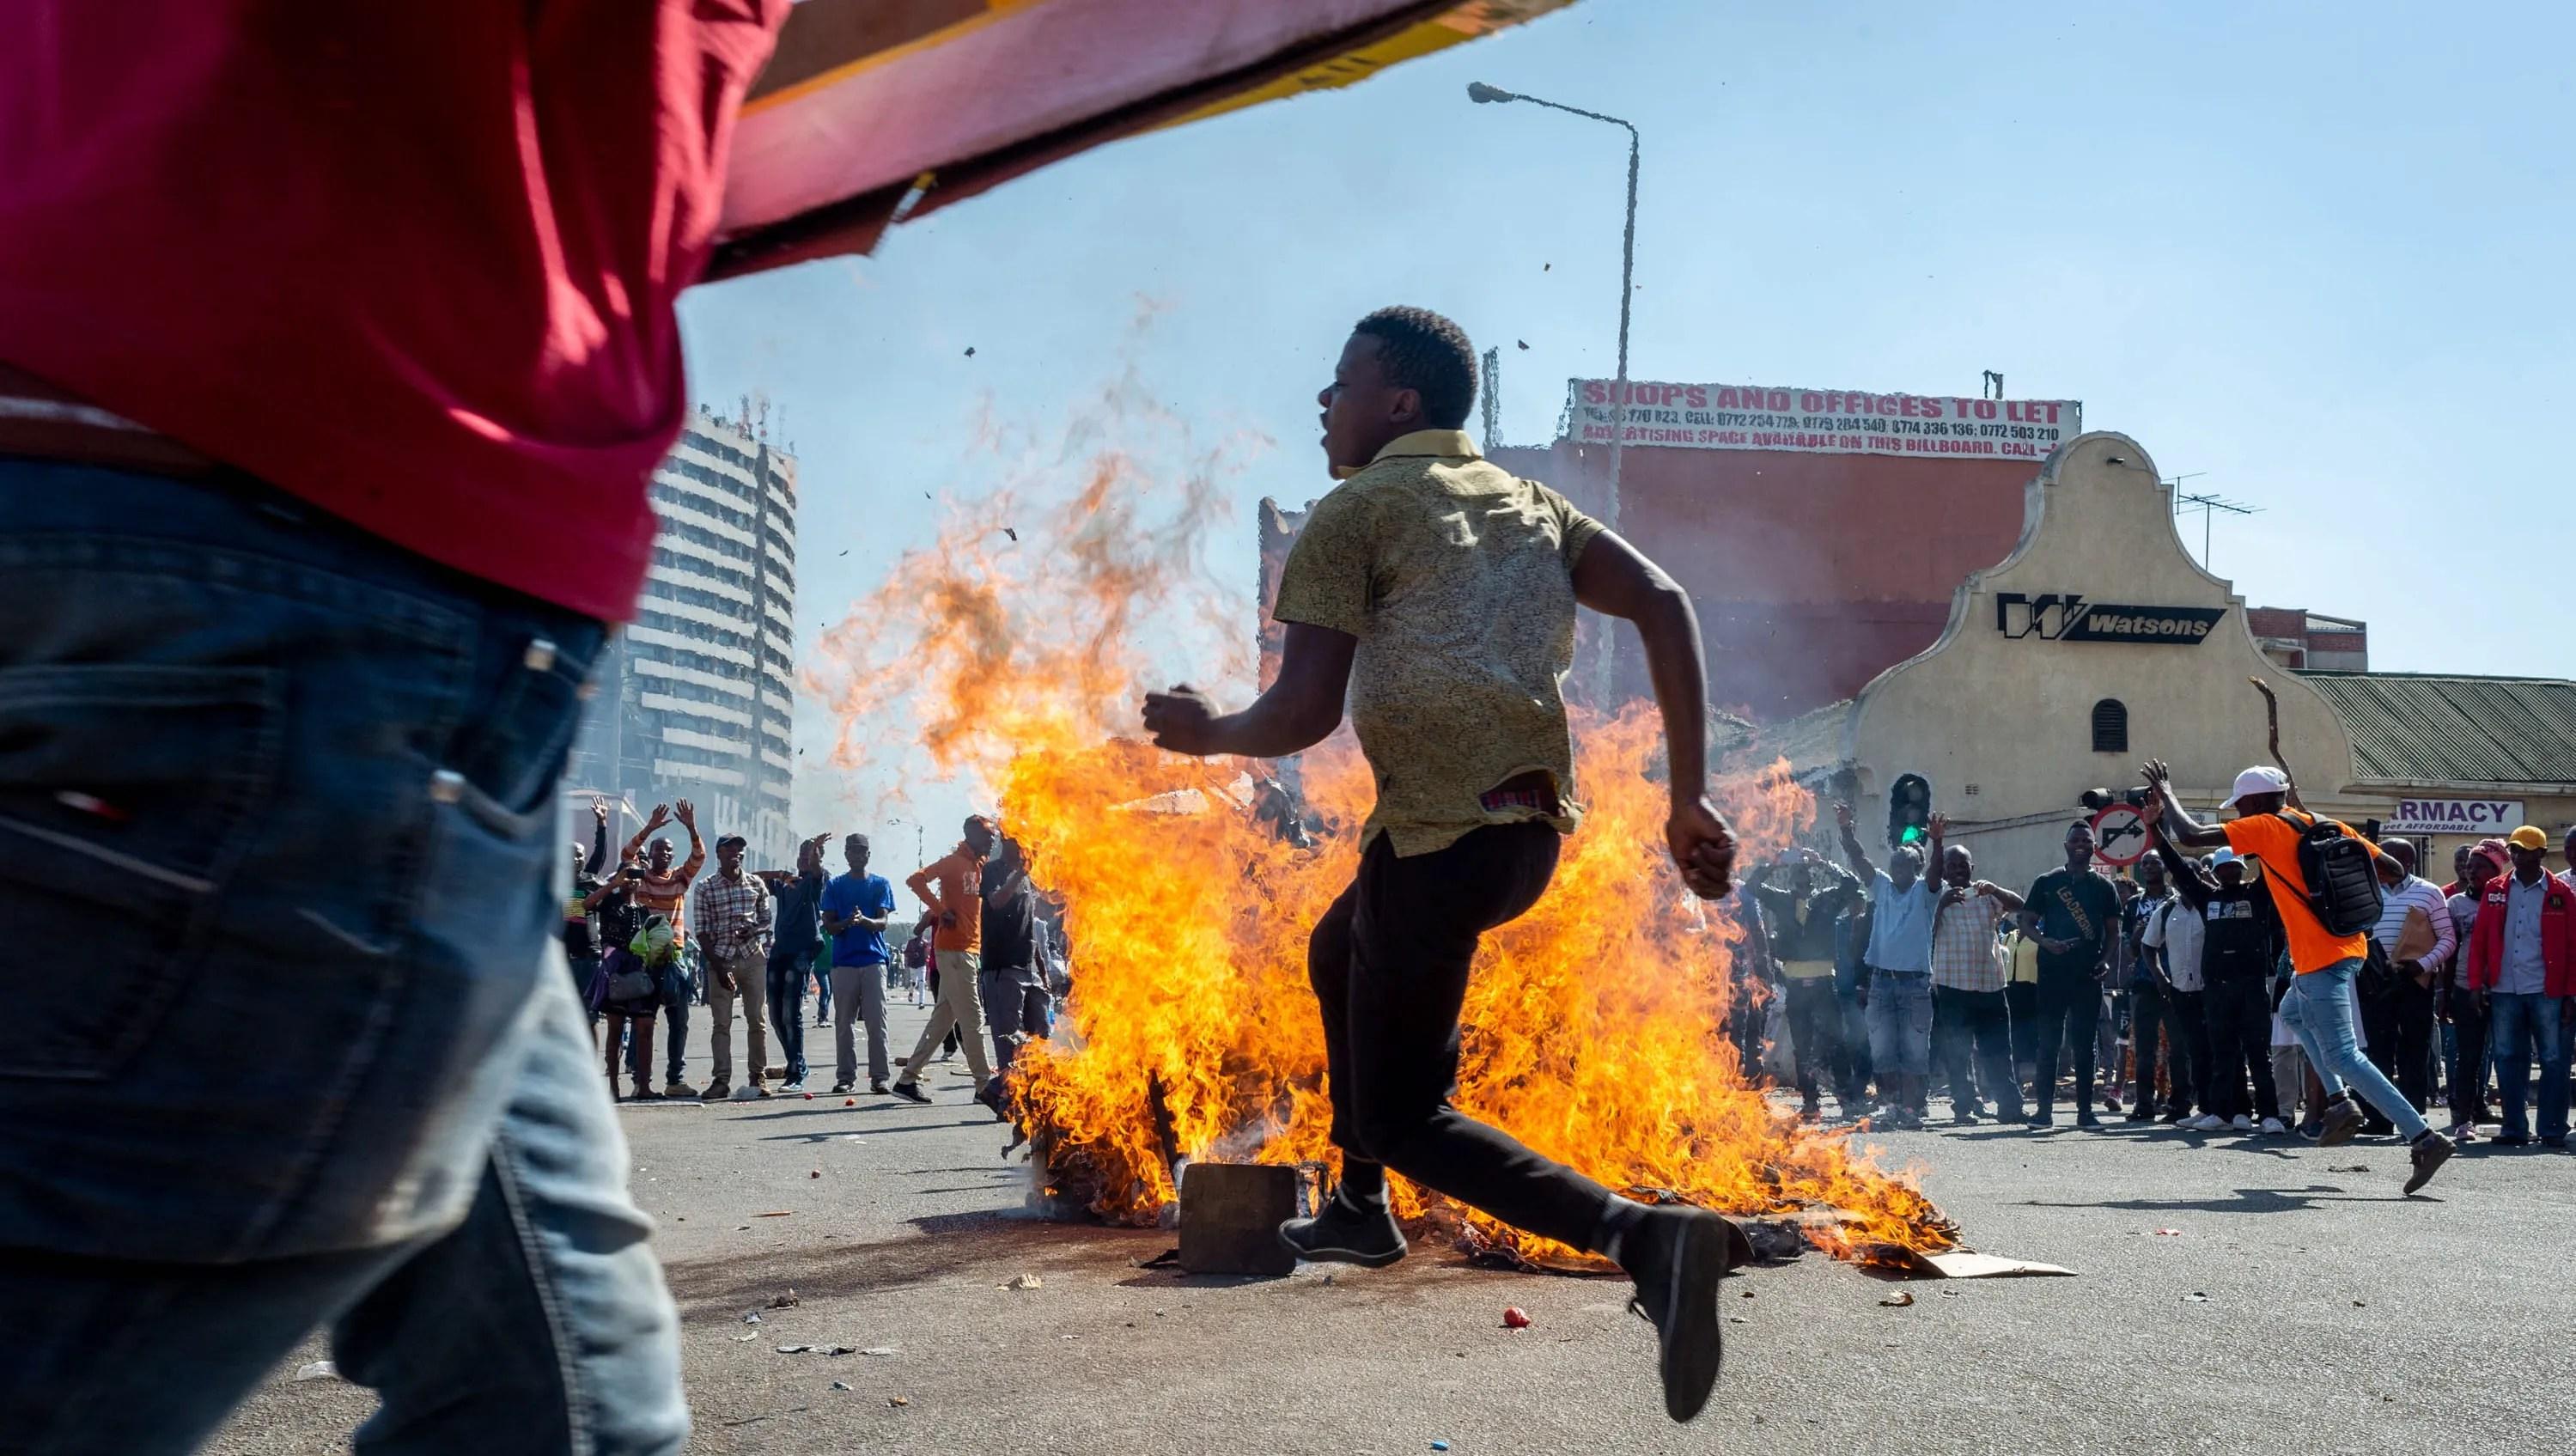 Zimbabwe President Emmerson Mnangagwa appeals for calm